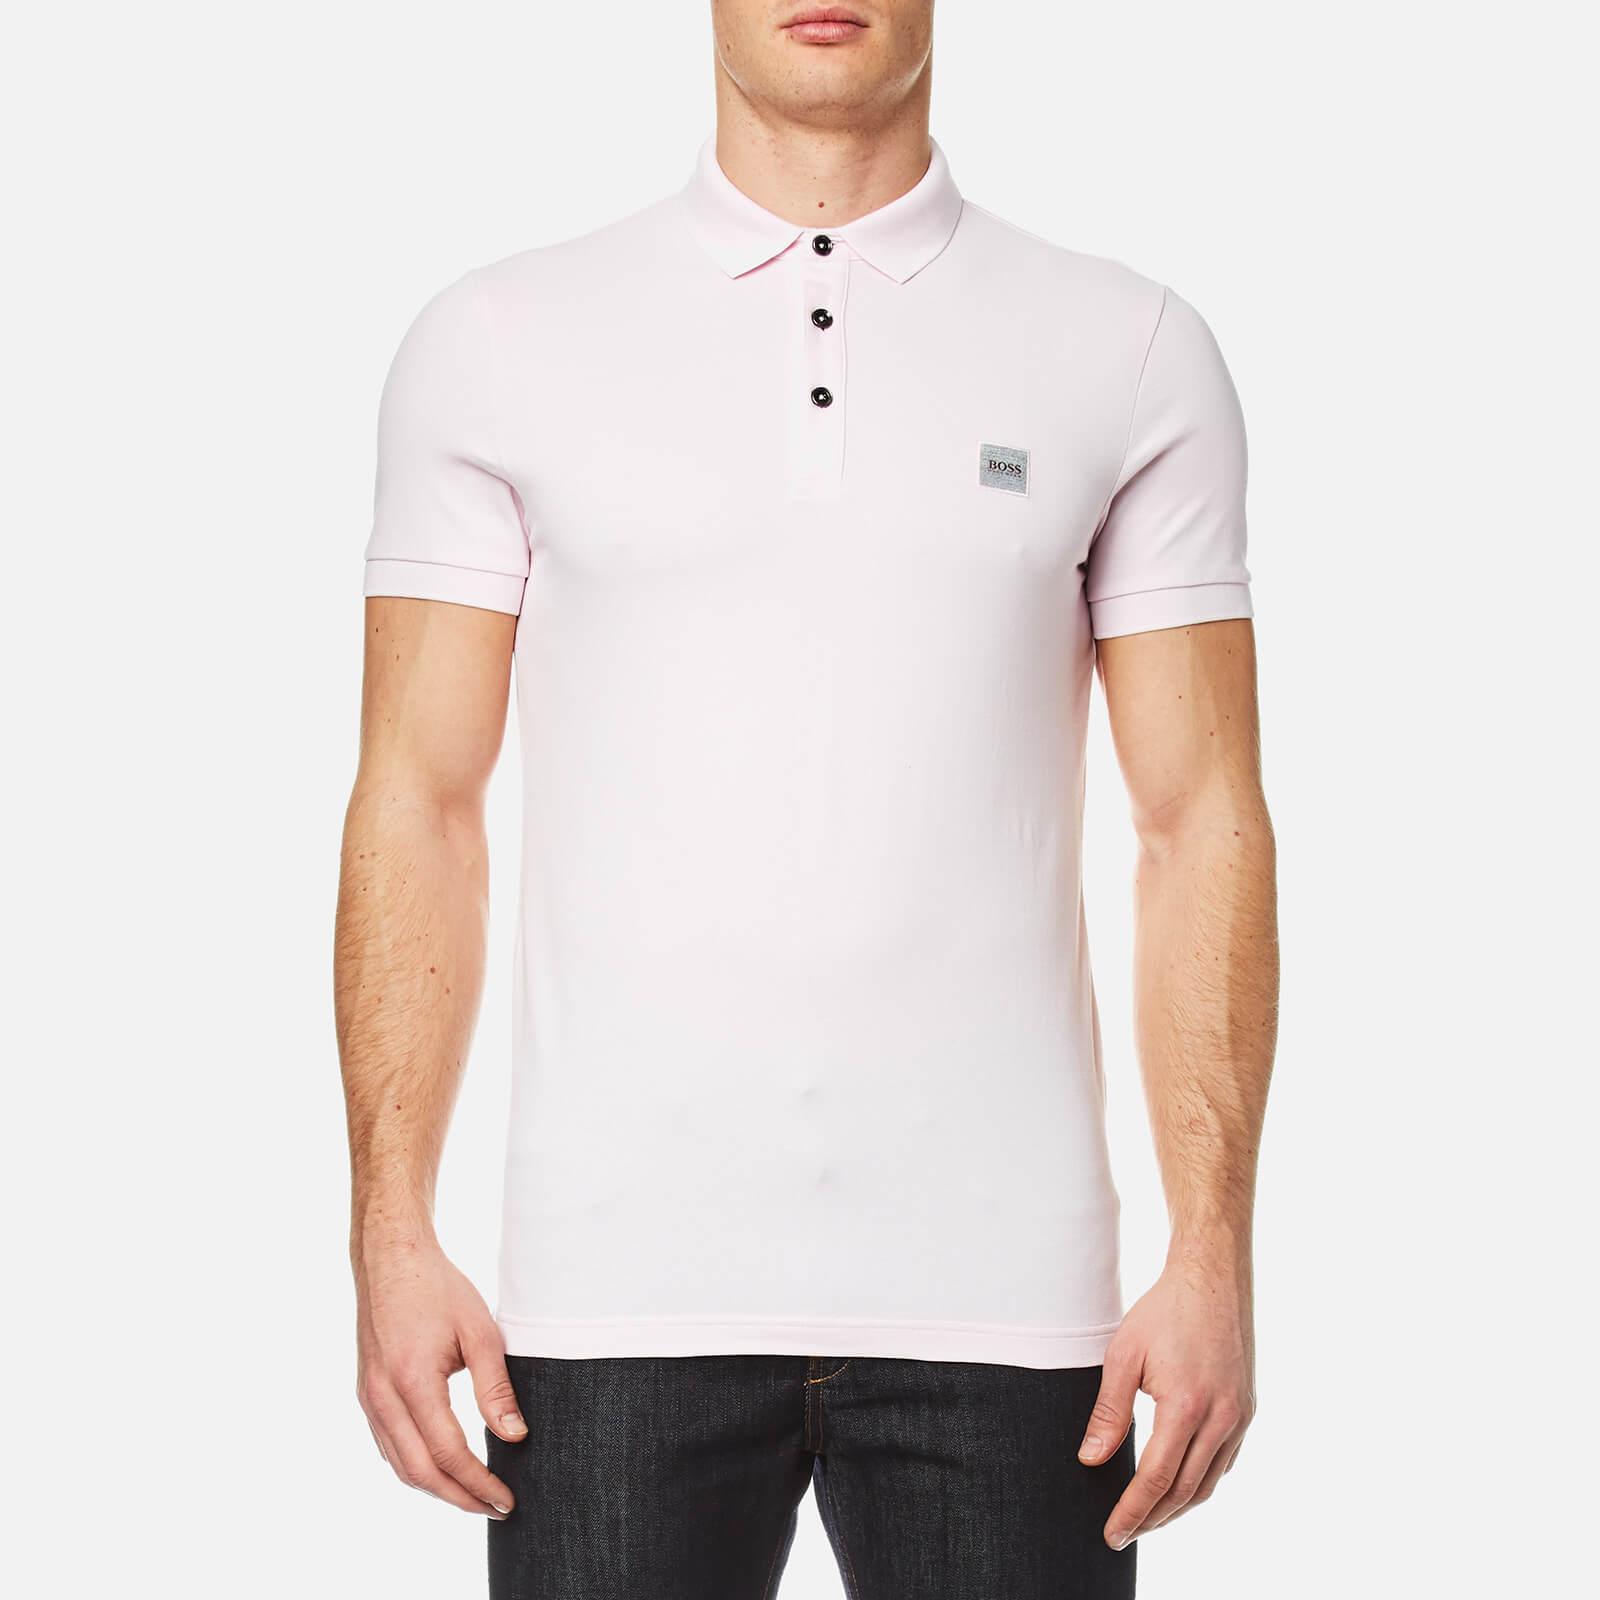 0819eca3 BOSS Orange Men's Pavlik Polo Shirt - Pastel Pink - Free UK Delivery over  £50